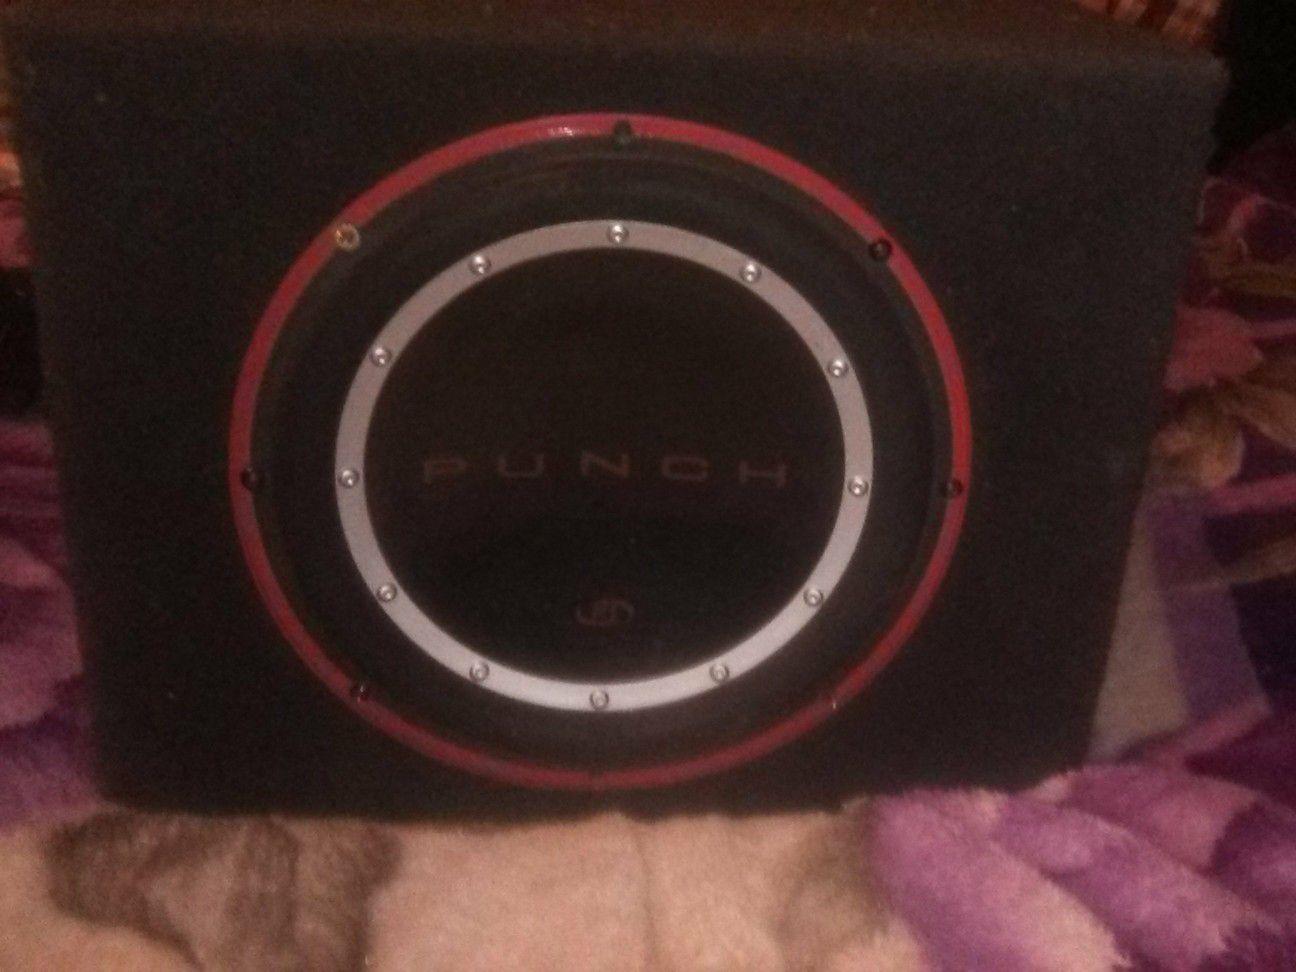 Rockford fosgate punch 10 inch speaker